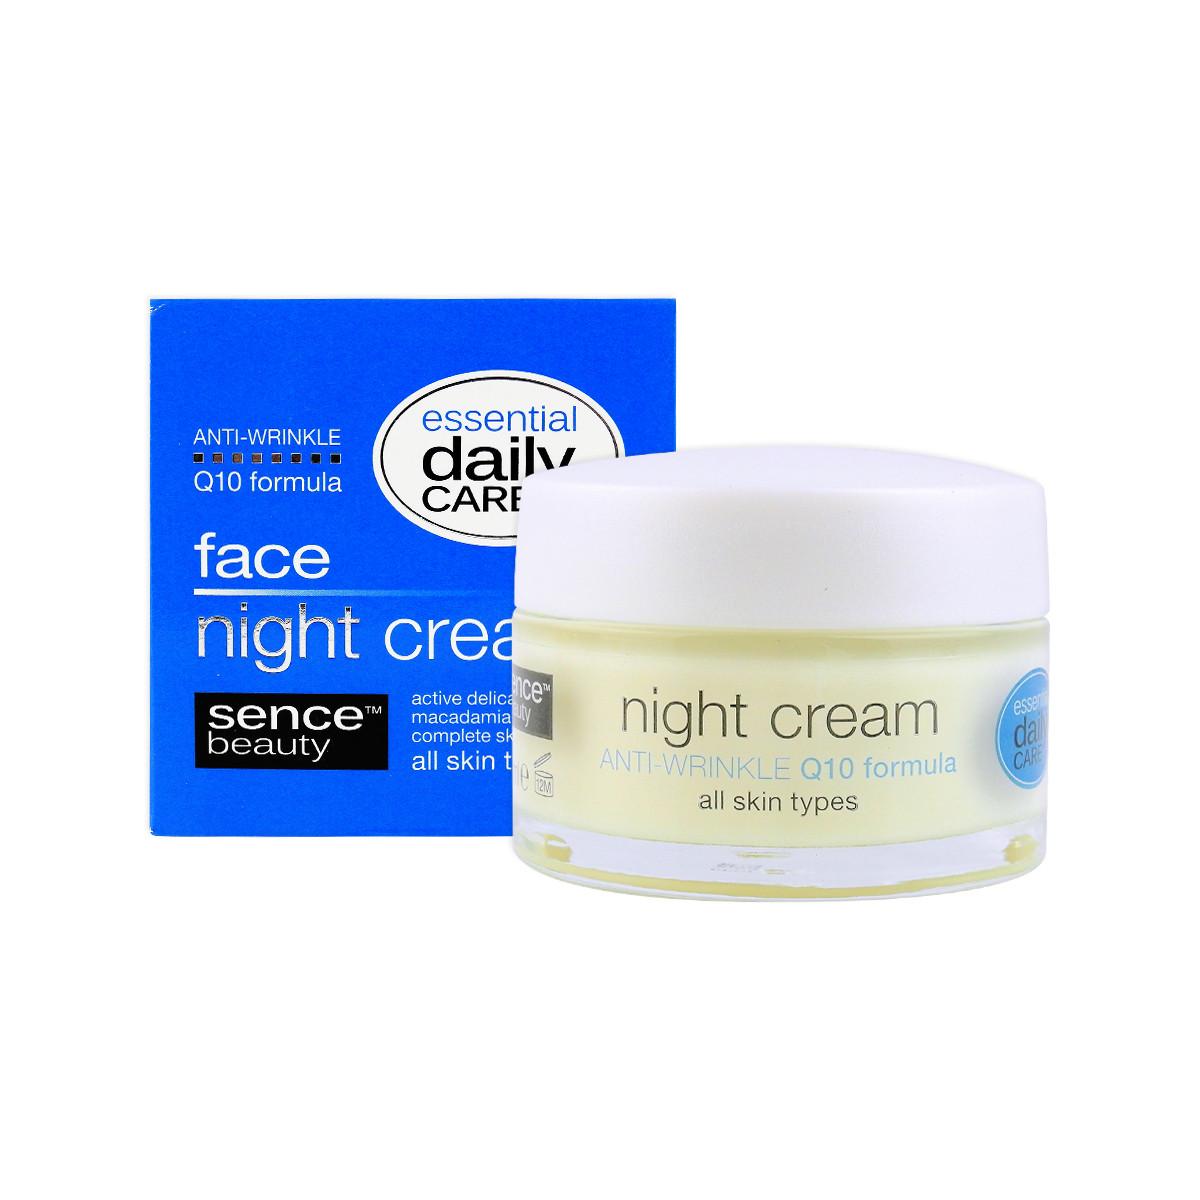 image of 歐洲Sencebeauty Q10緊實煥顏晚霜50ml   Europe Sencebeauty Night Cream Anti Wrinkle Q10 Formula 50ml